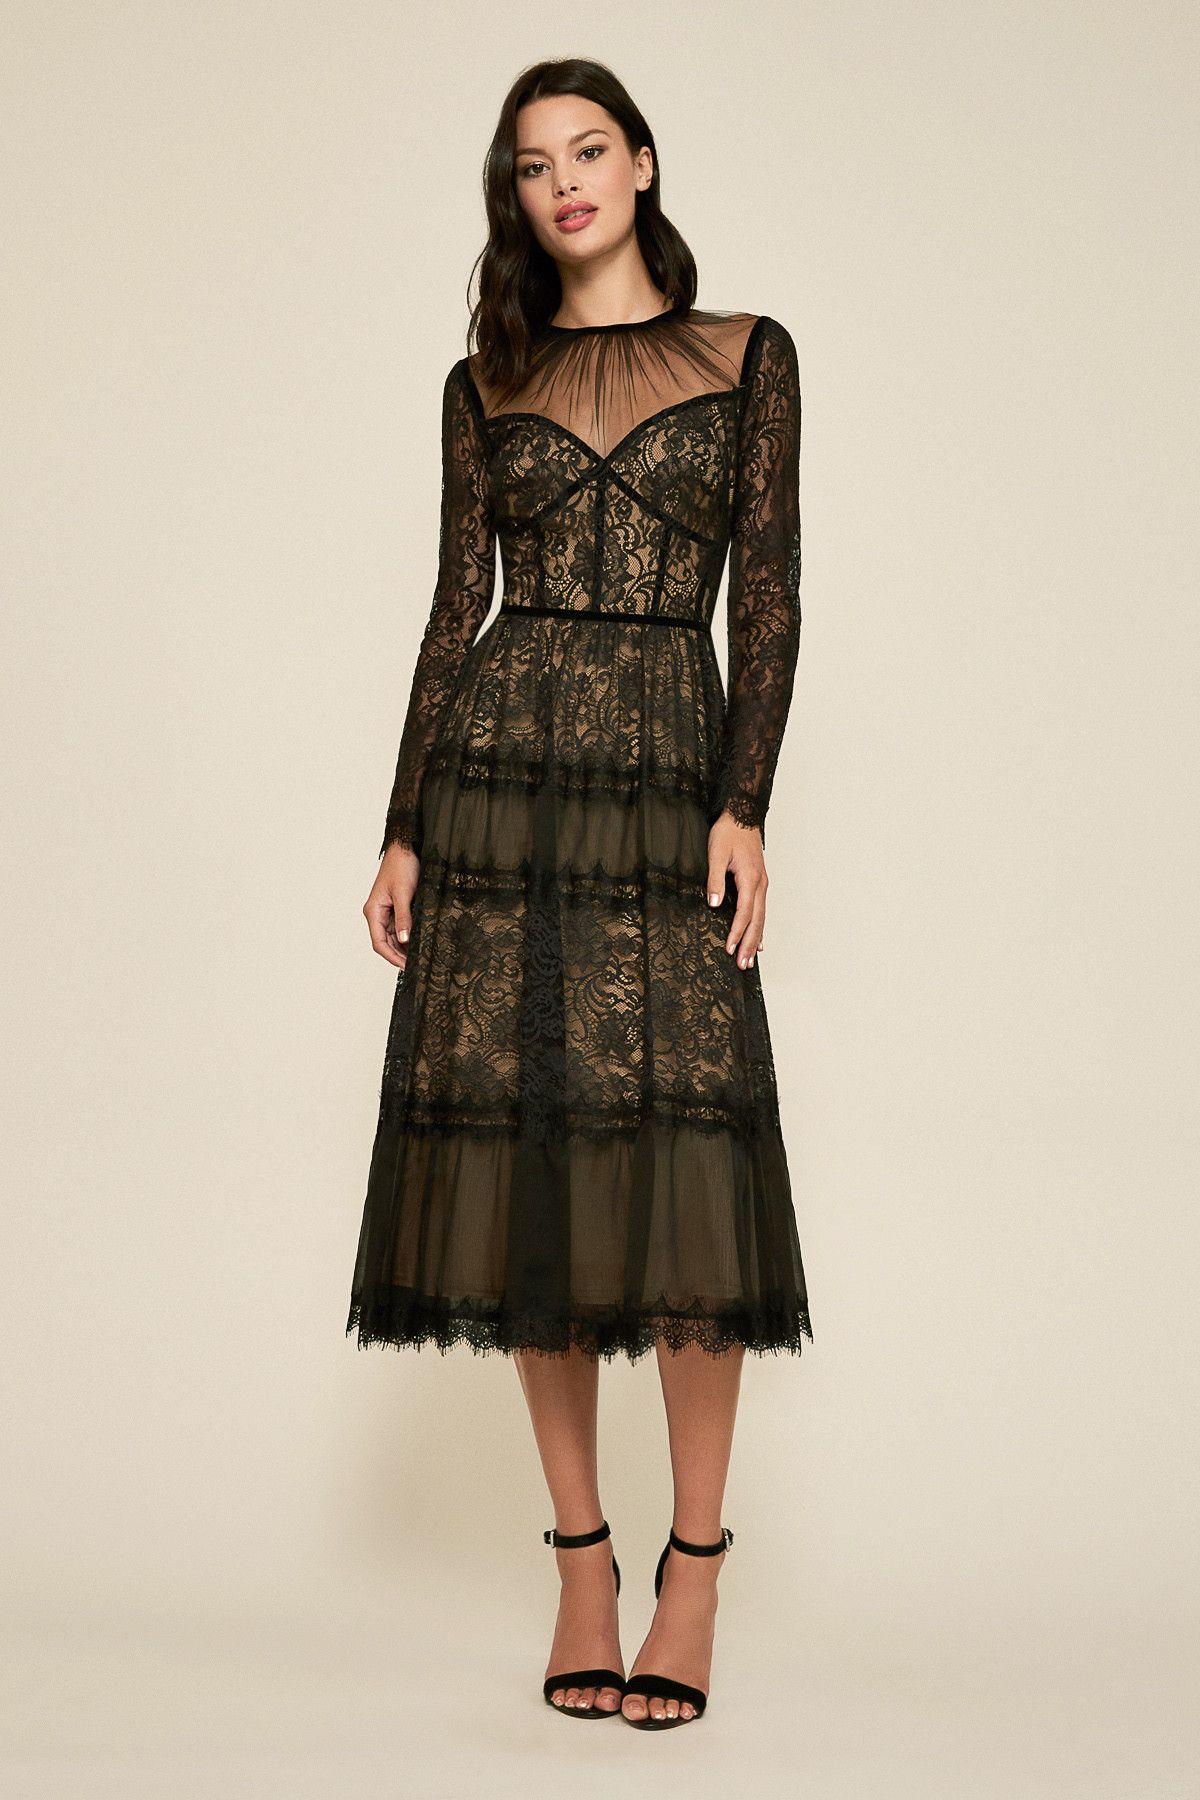 d1d35b57f4 Tatiana Long-Sleeve Tea-Length Lace Dress | Tadashi Shoji | Random ...